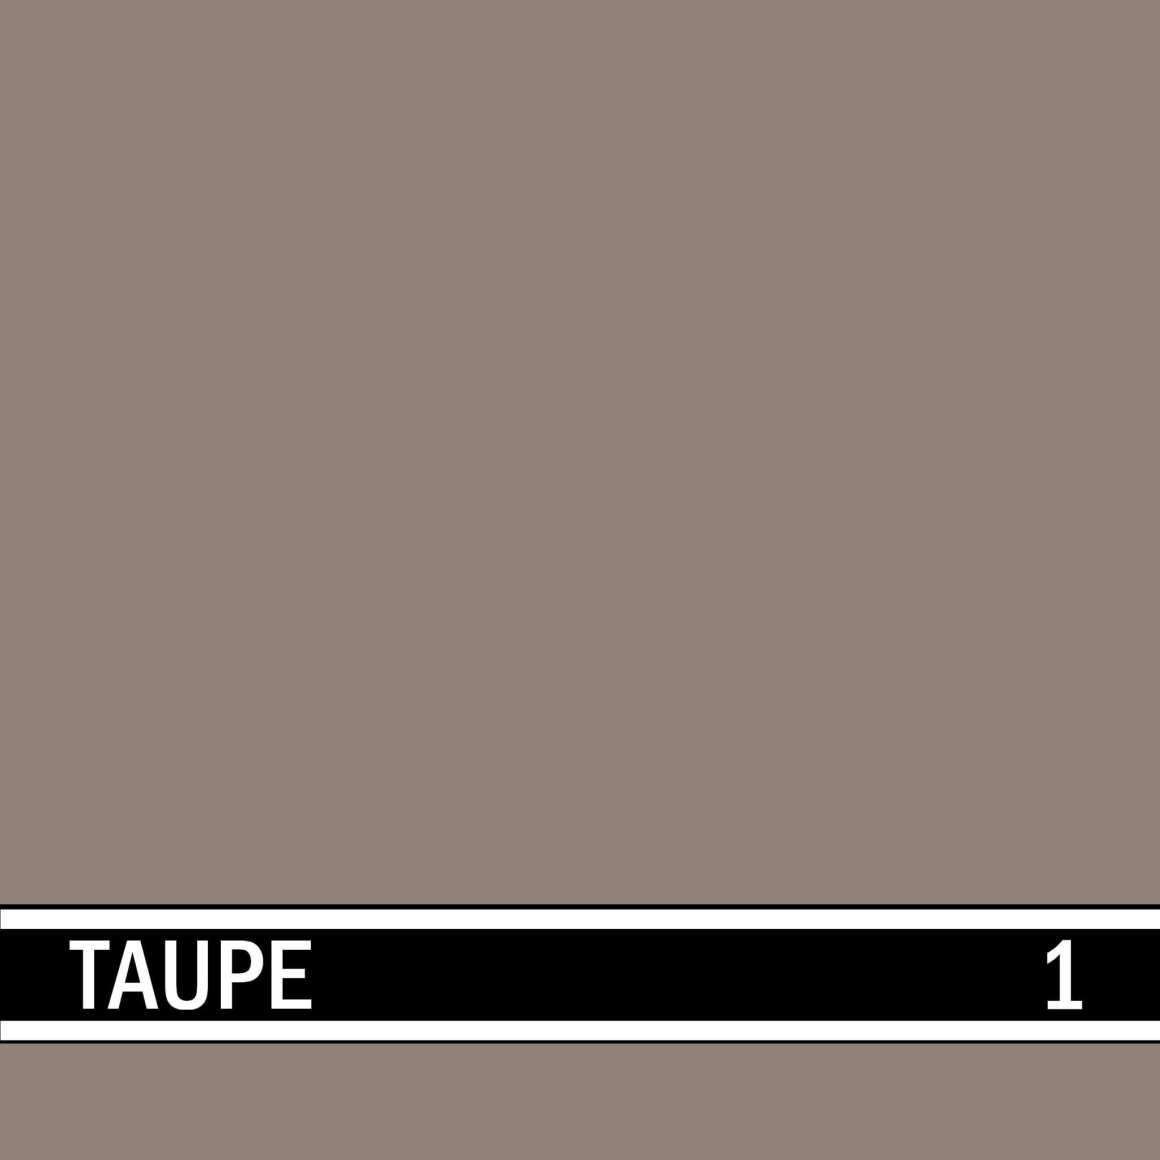 Taupe integral concrete color for stamped concrete and decorative colored concrete